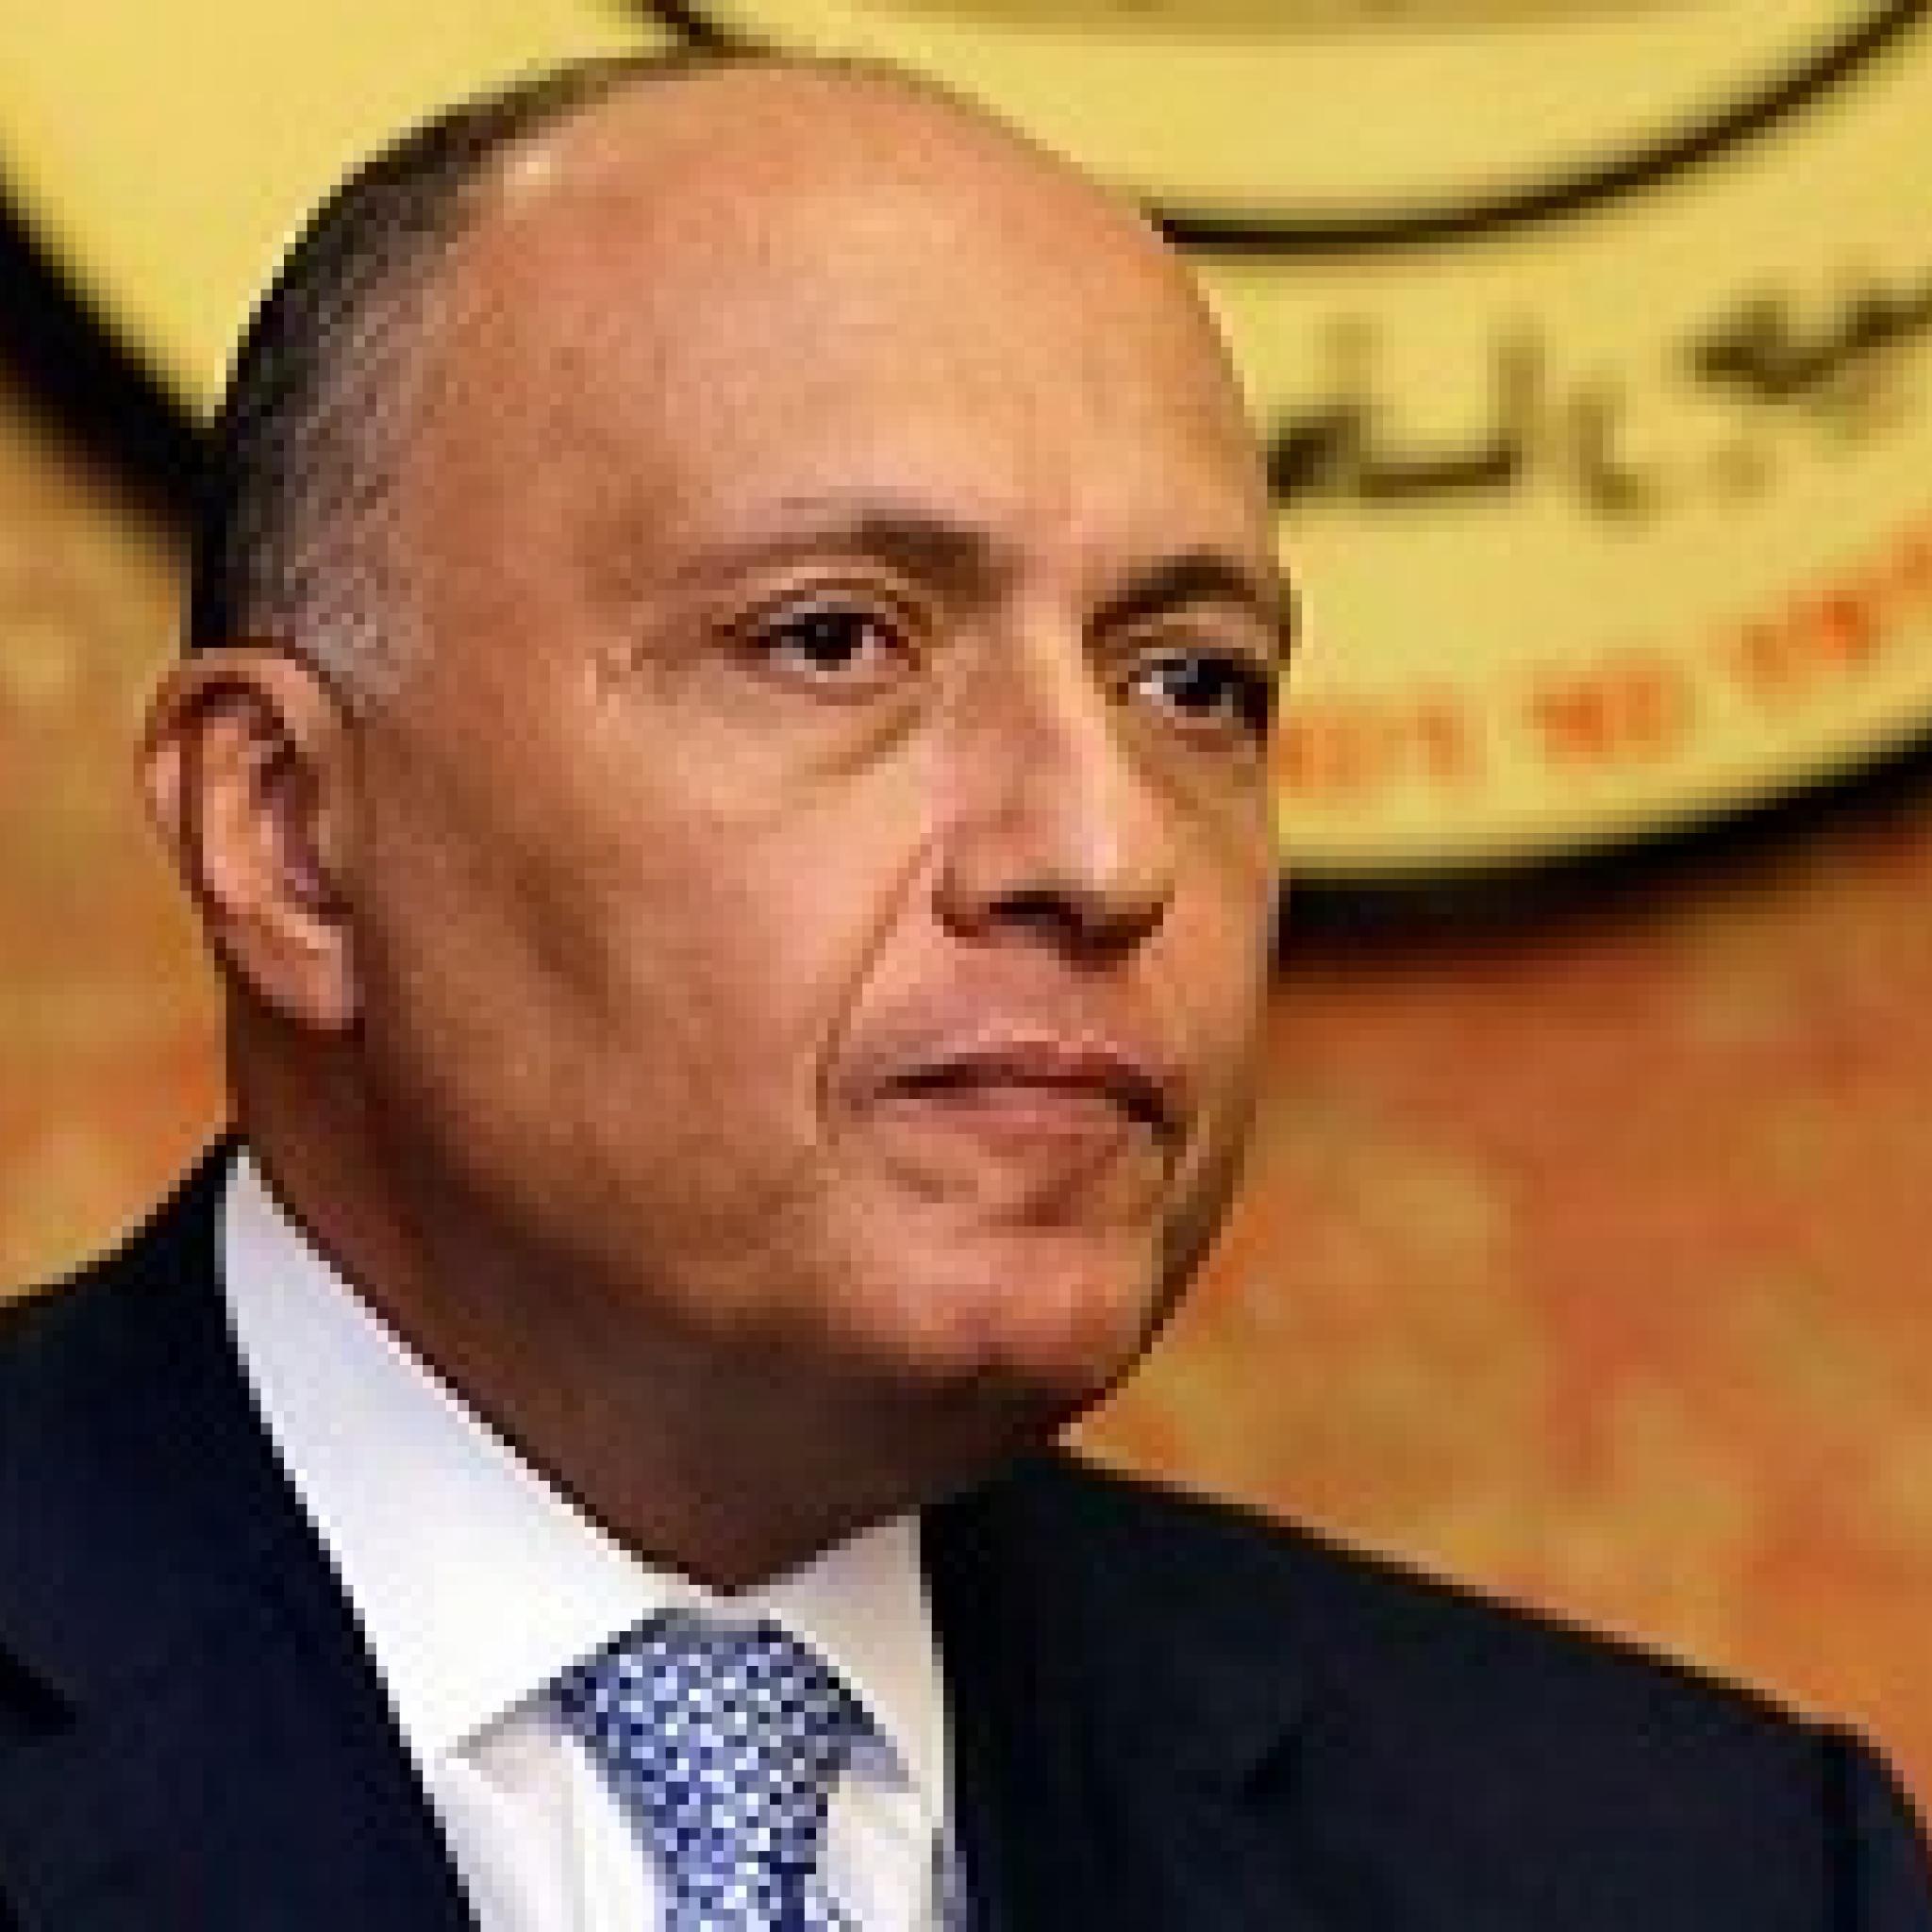 NEWS: የግብፁ የውጭ ጉዳይ ሚኒስትር በግድቡ ላይ ለመወያየት ወደ አዲስ አበባ ሊመጡ ነው - Egypt's Foreign Minister is Coming to Addis